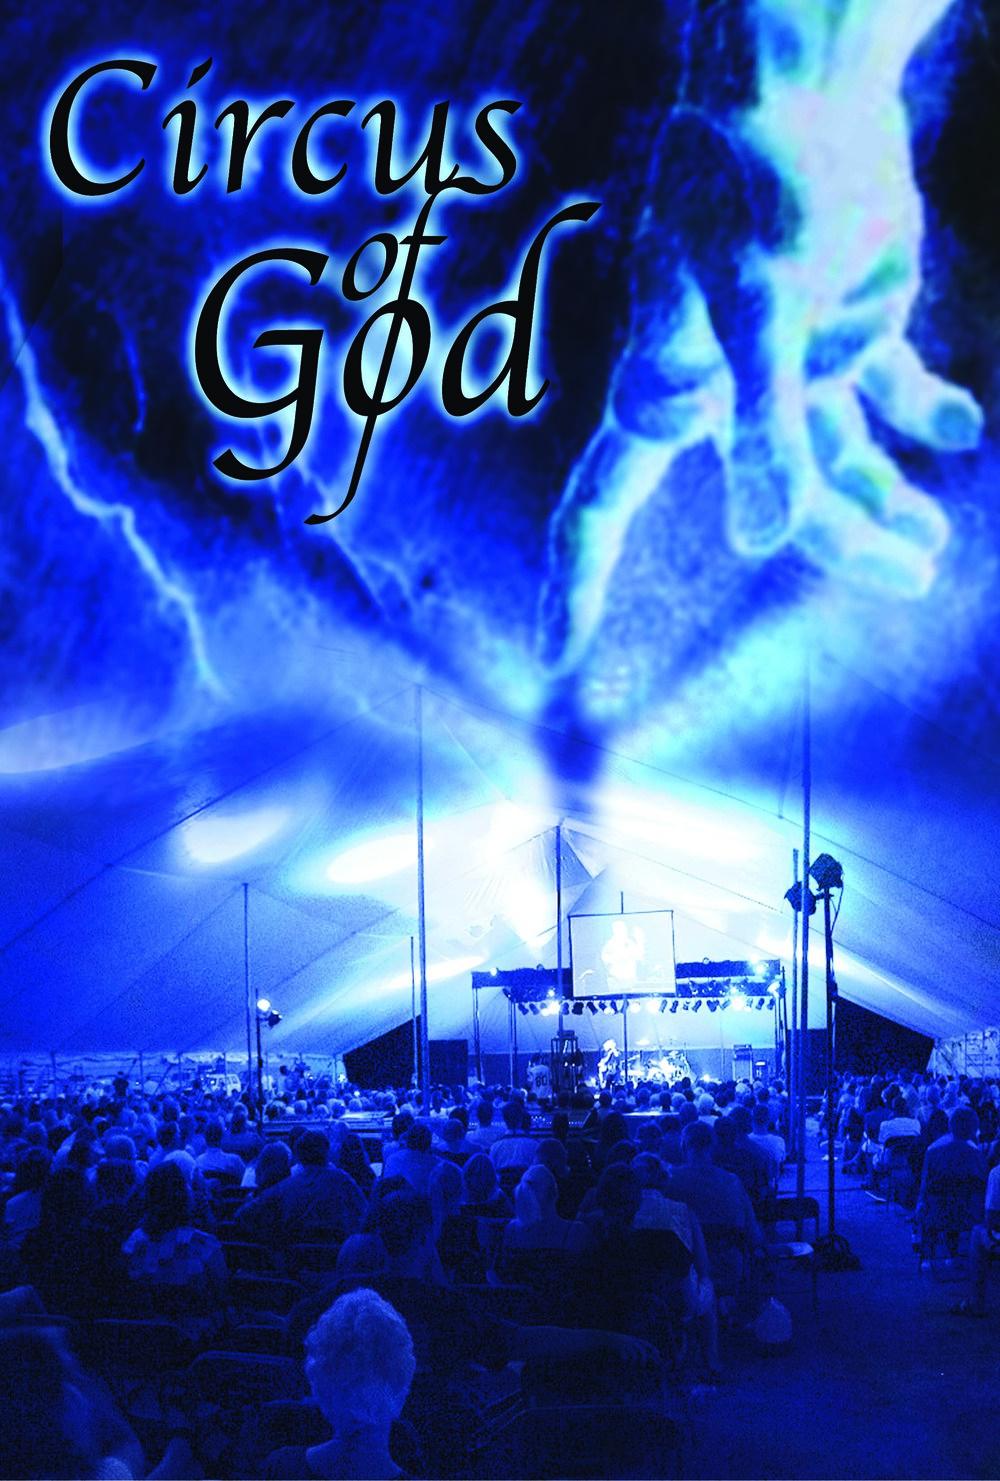 Circus of God